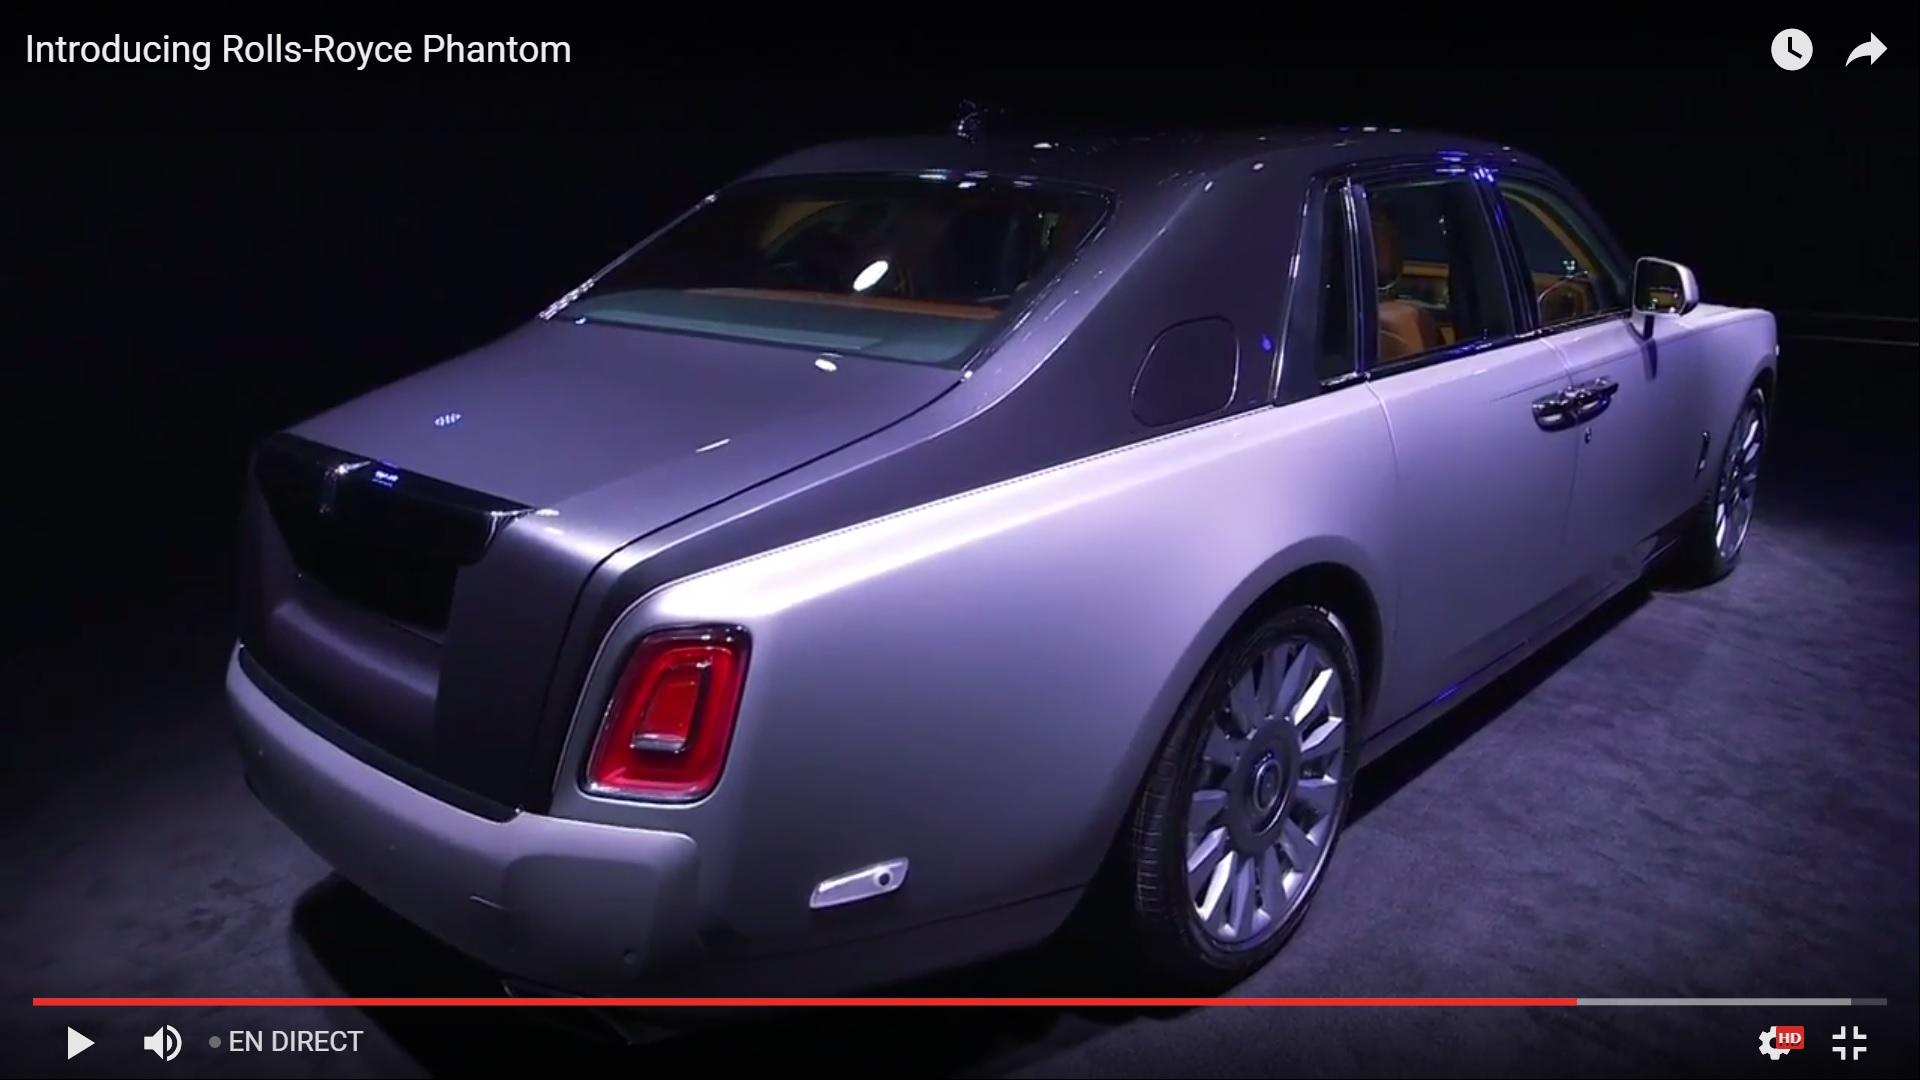 2017 - [Rolls Royce] Phantom - Page 4 Sans_t20